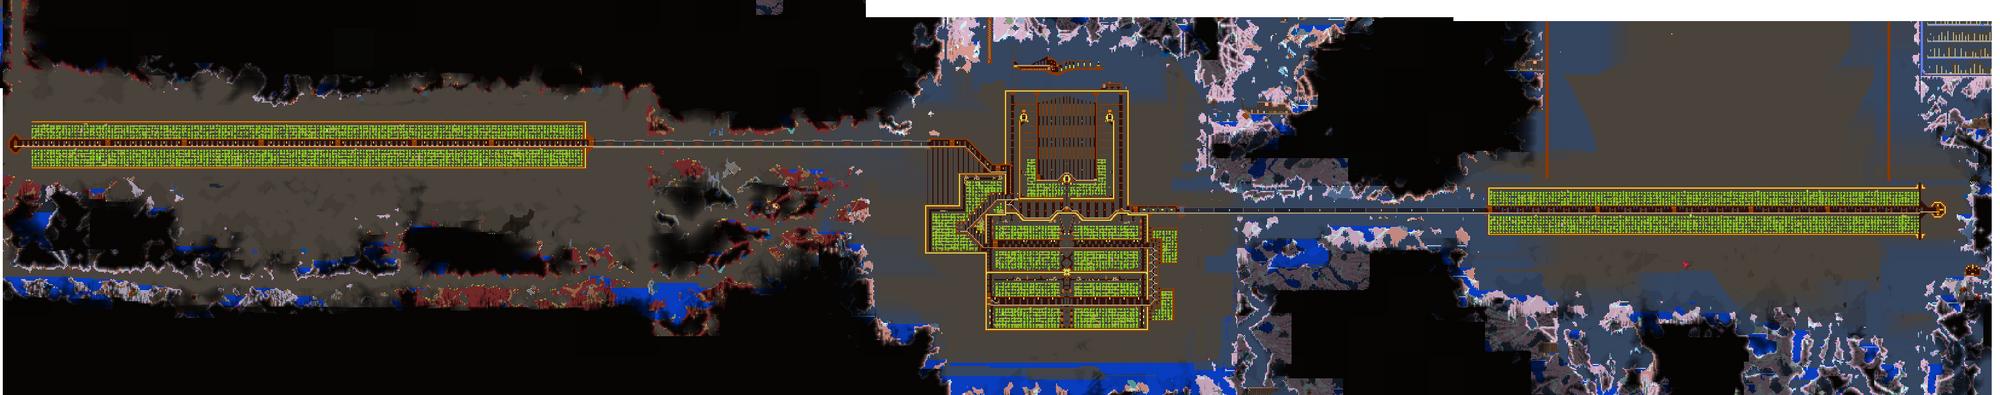 User Blogvazilin Fully Automatic Plantera Farm Afk Terraria Wiring Traps Wiki Fandom Powered By Wikia